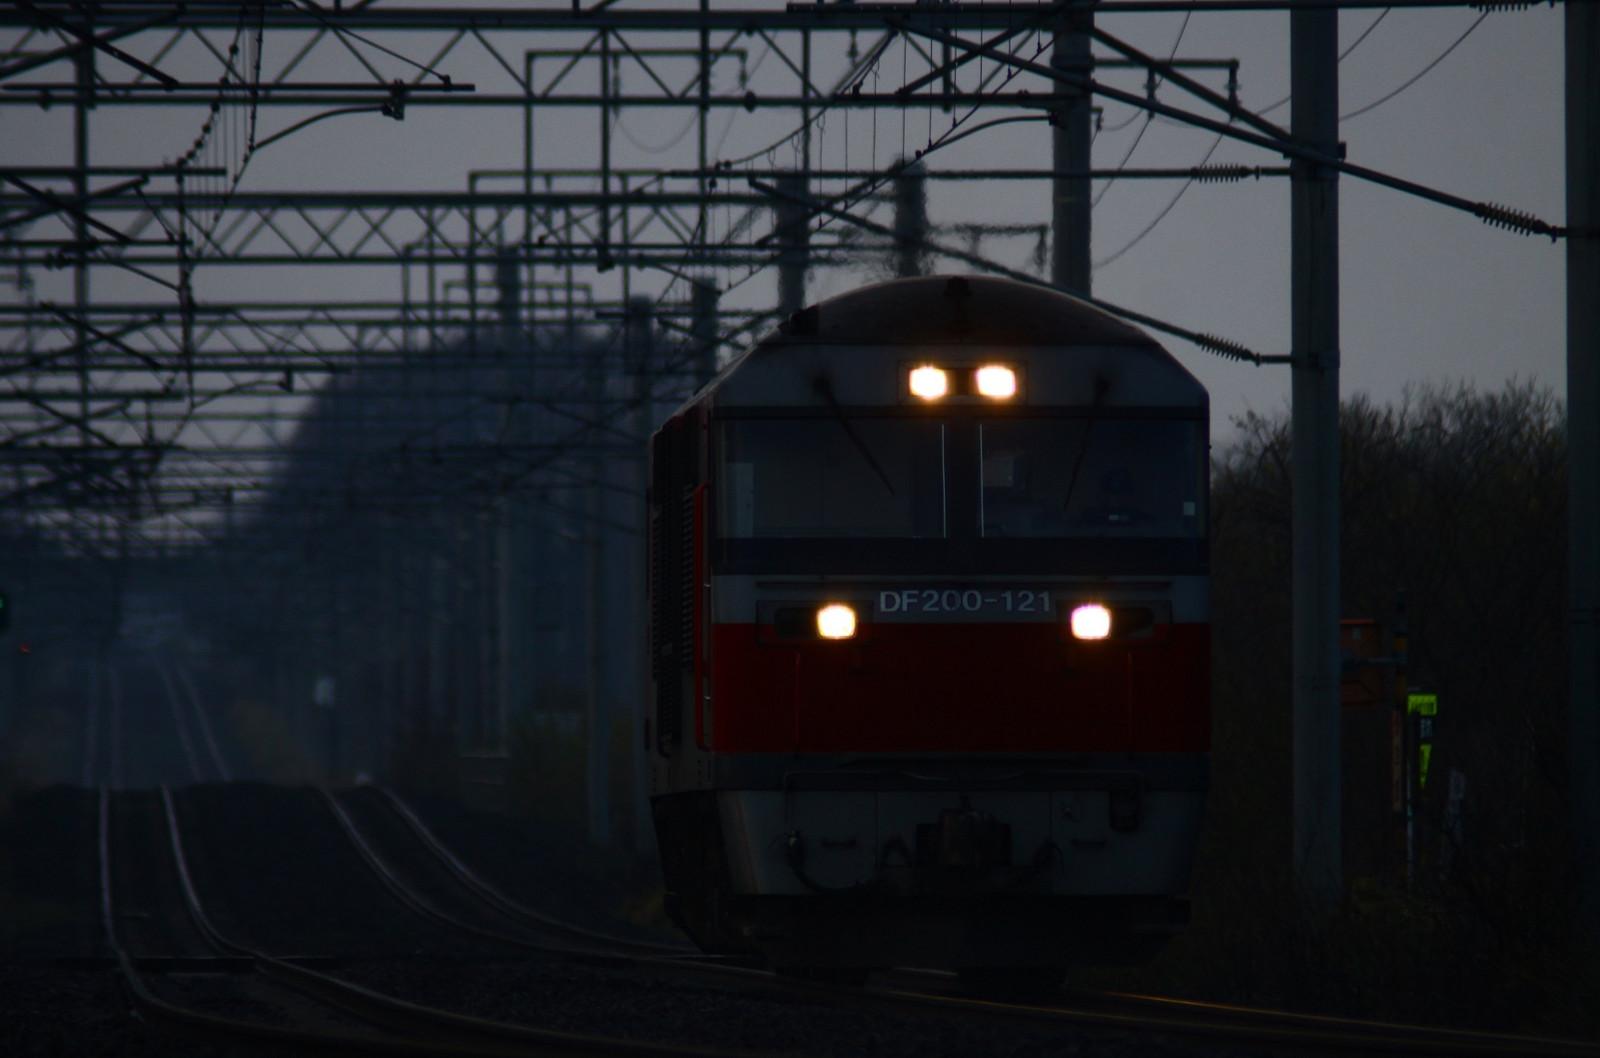 Jr1704291005